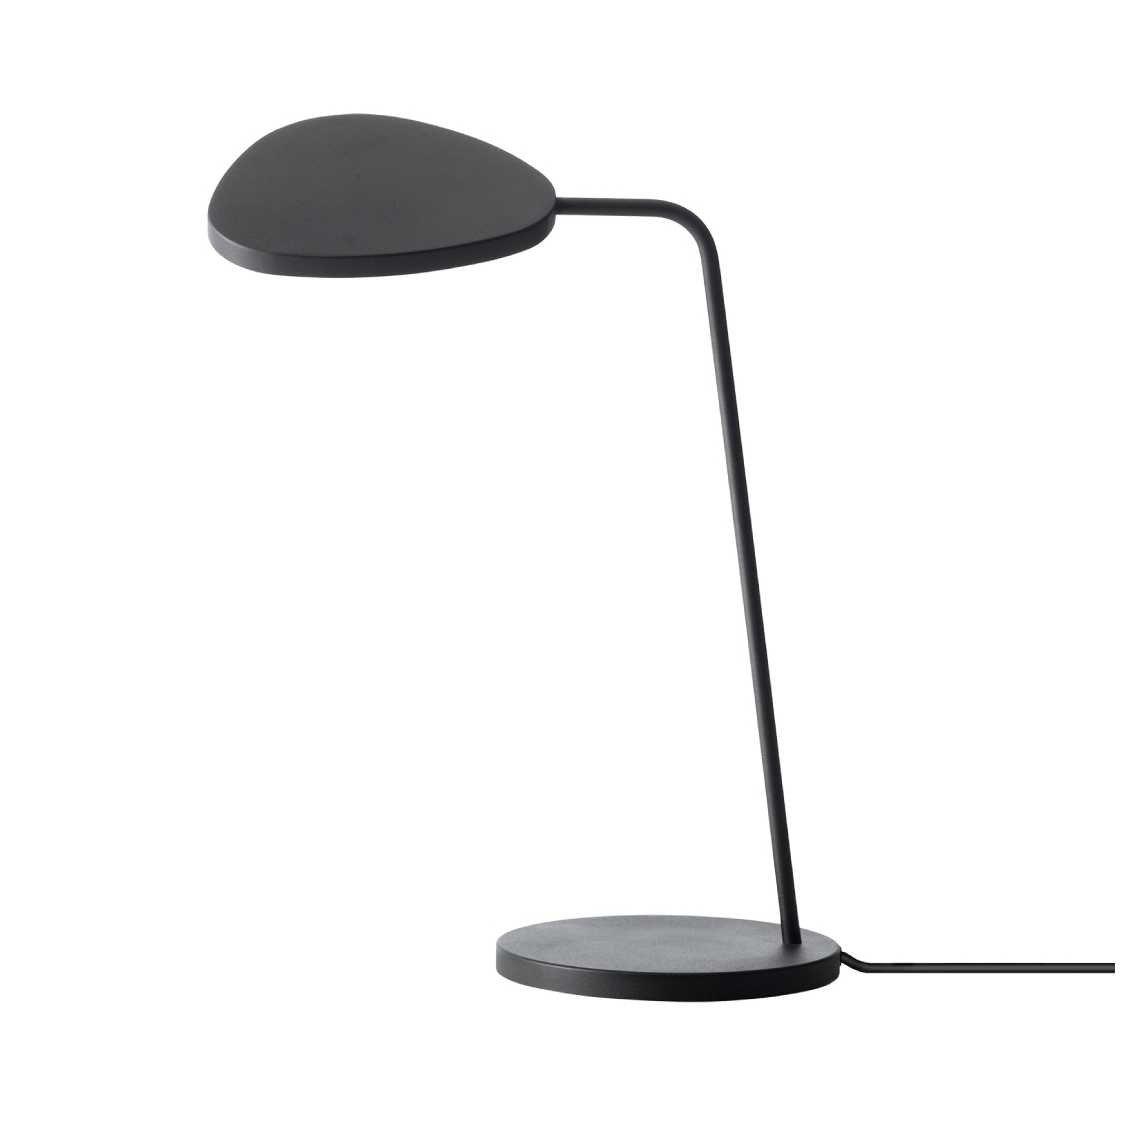 Muuto Leaf Tafellamp 2019 - Zwart